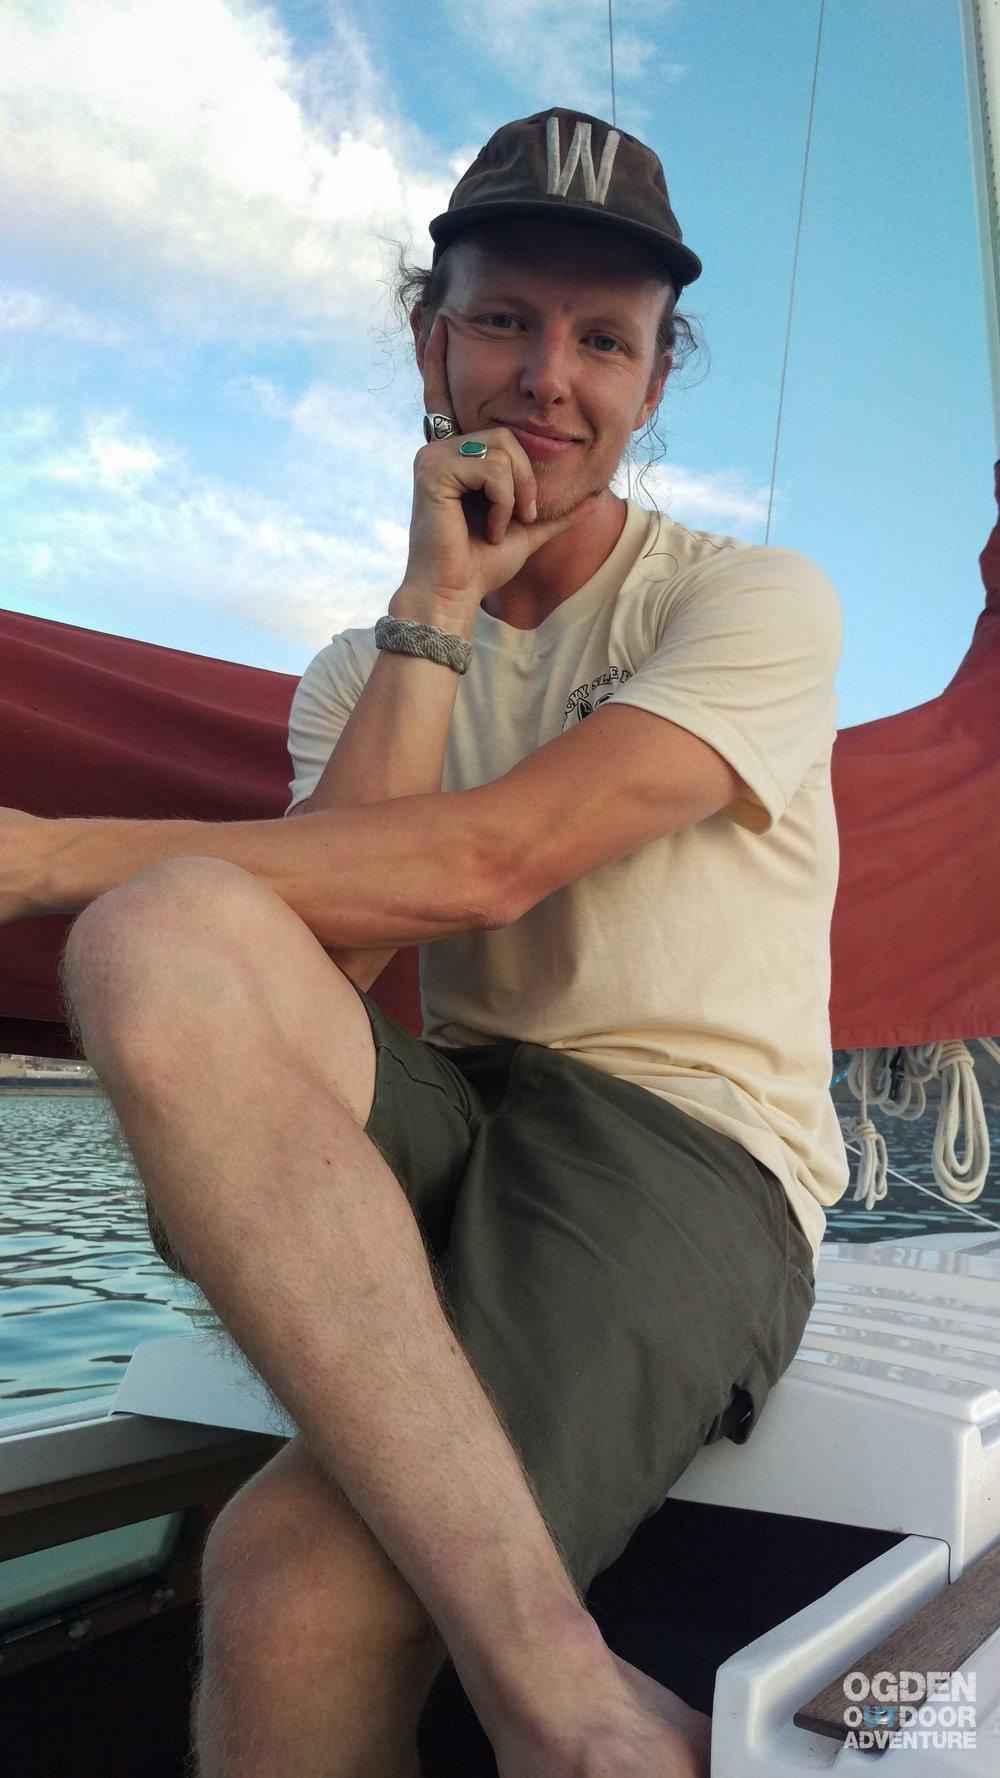 OOA Show 308 Salty Sailing-14.jpg